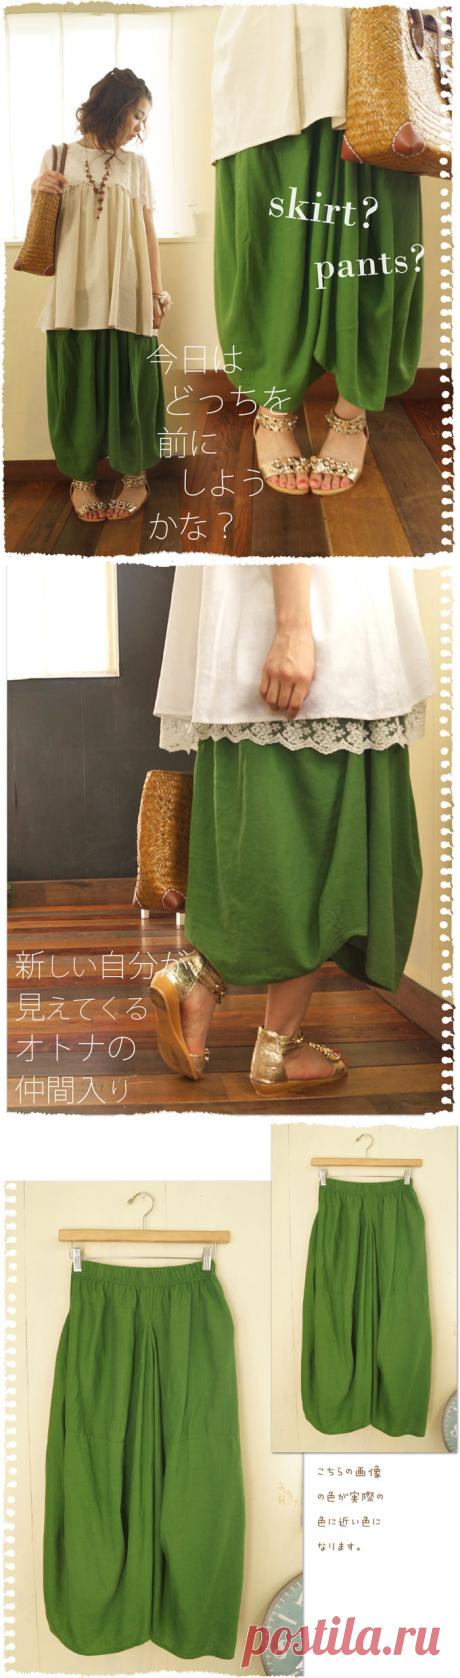 Японская юбка бохо. Зелёная.